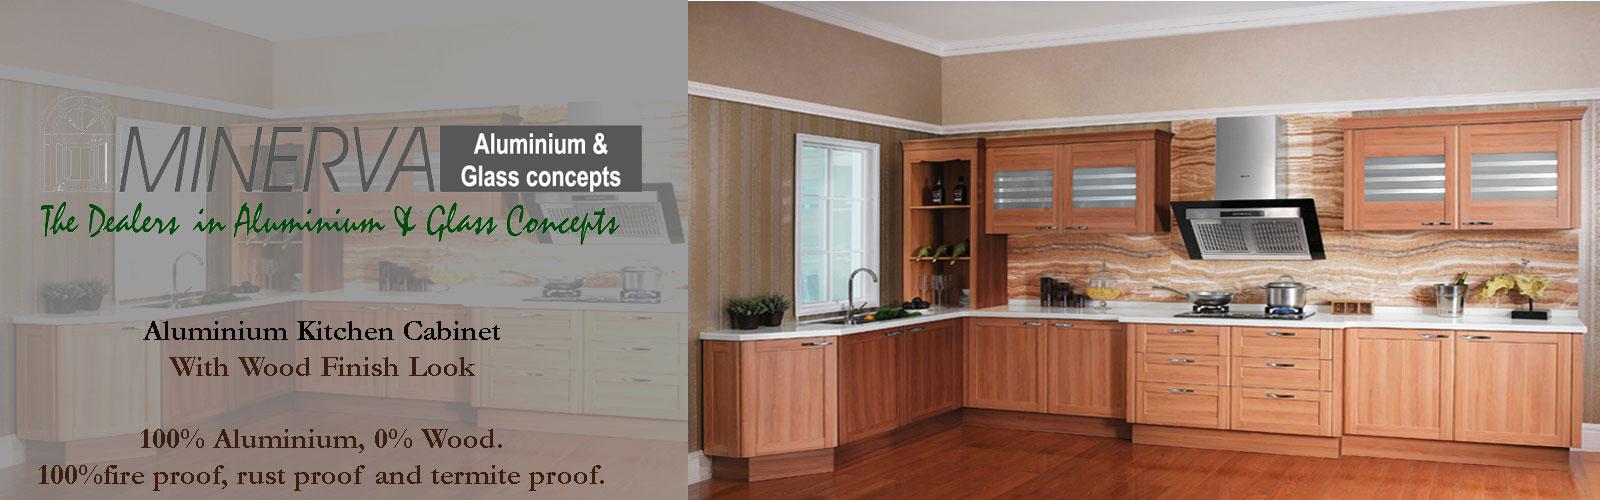 Aluminium Kitchen Cabinet Mfr Minerva Aluminium And Glass